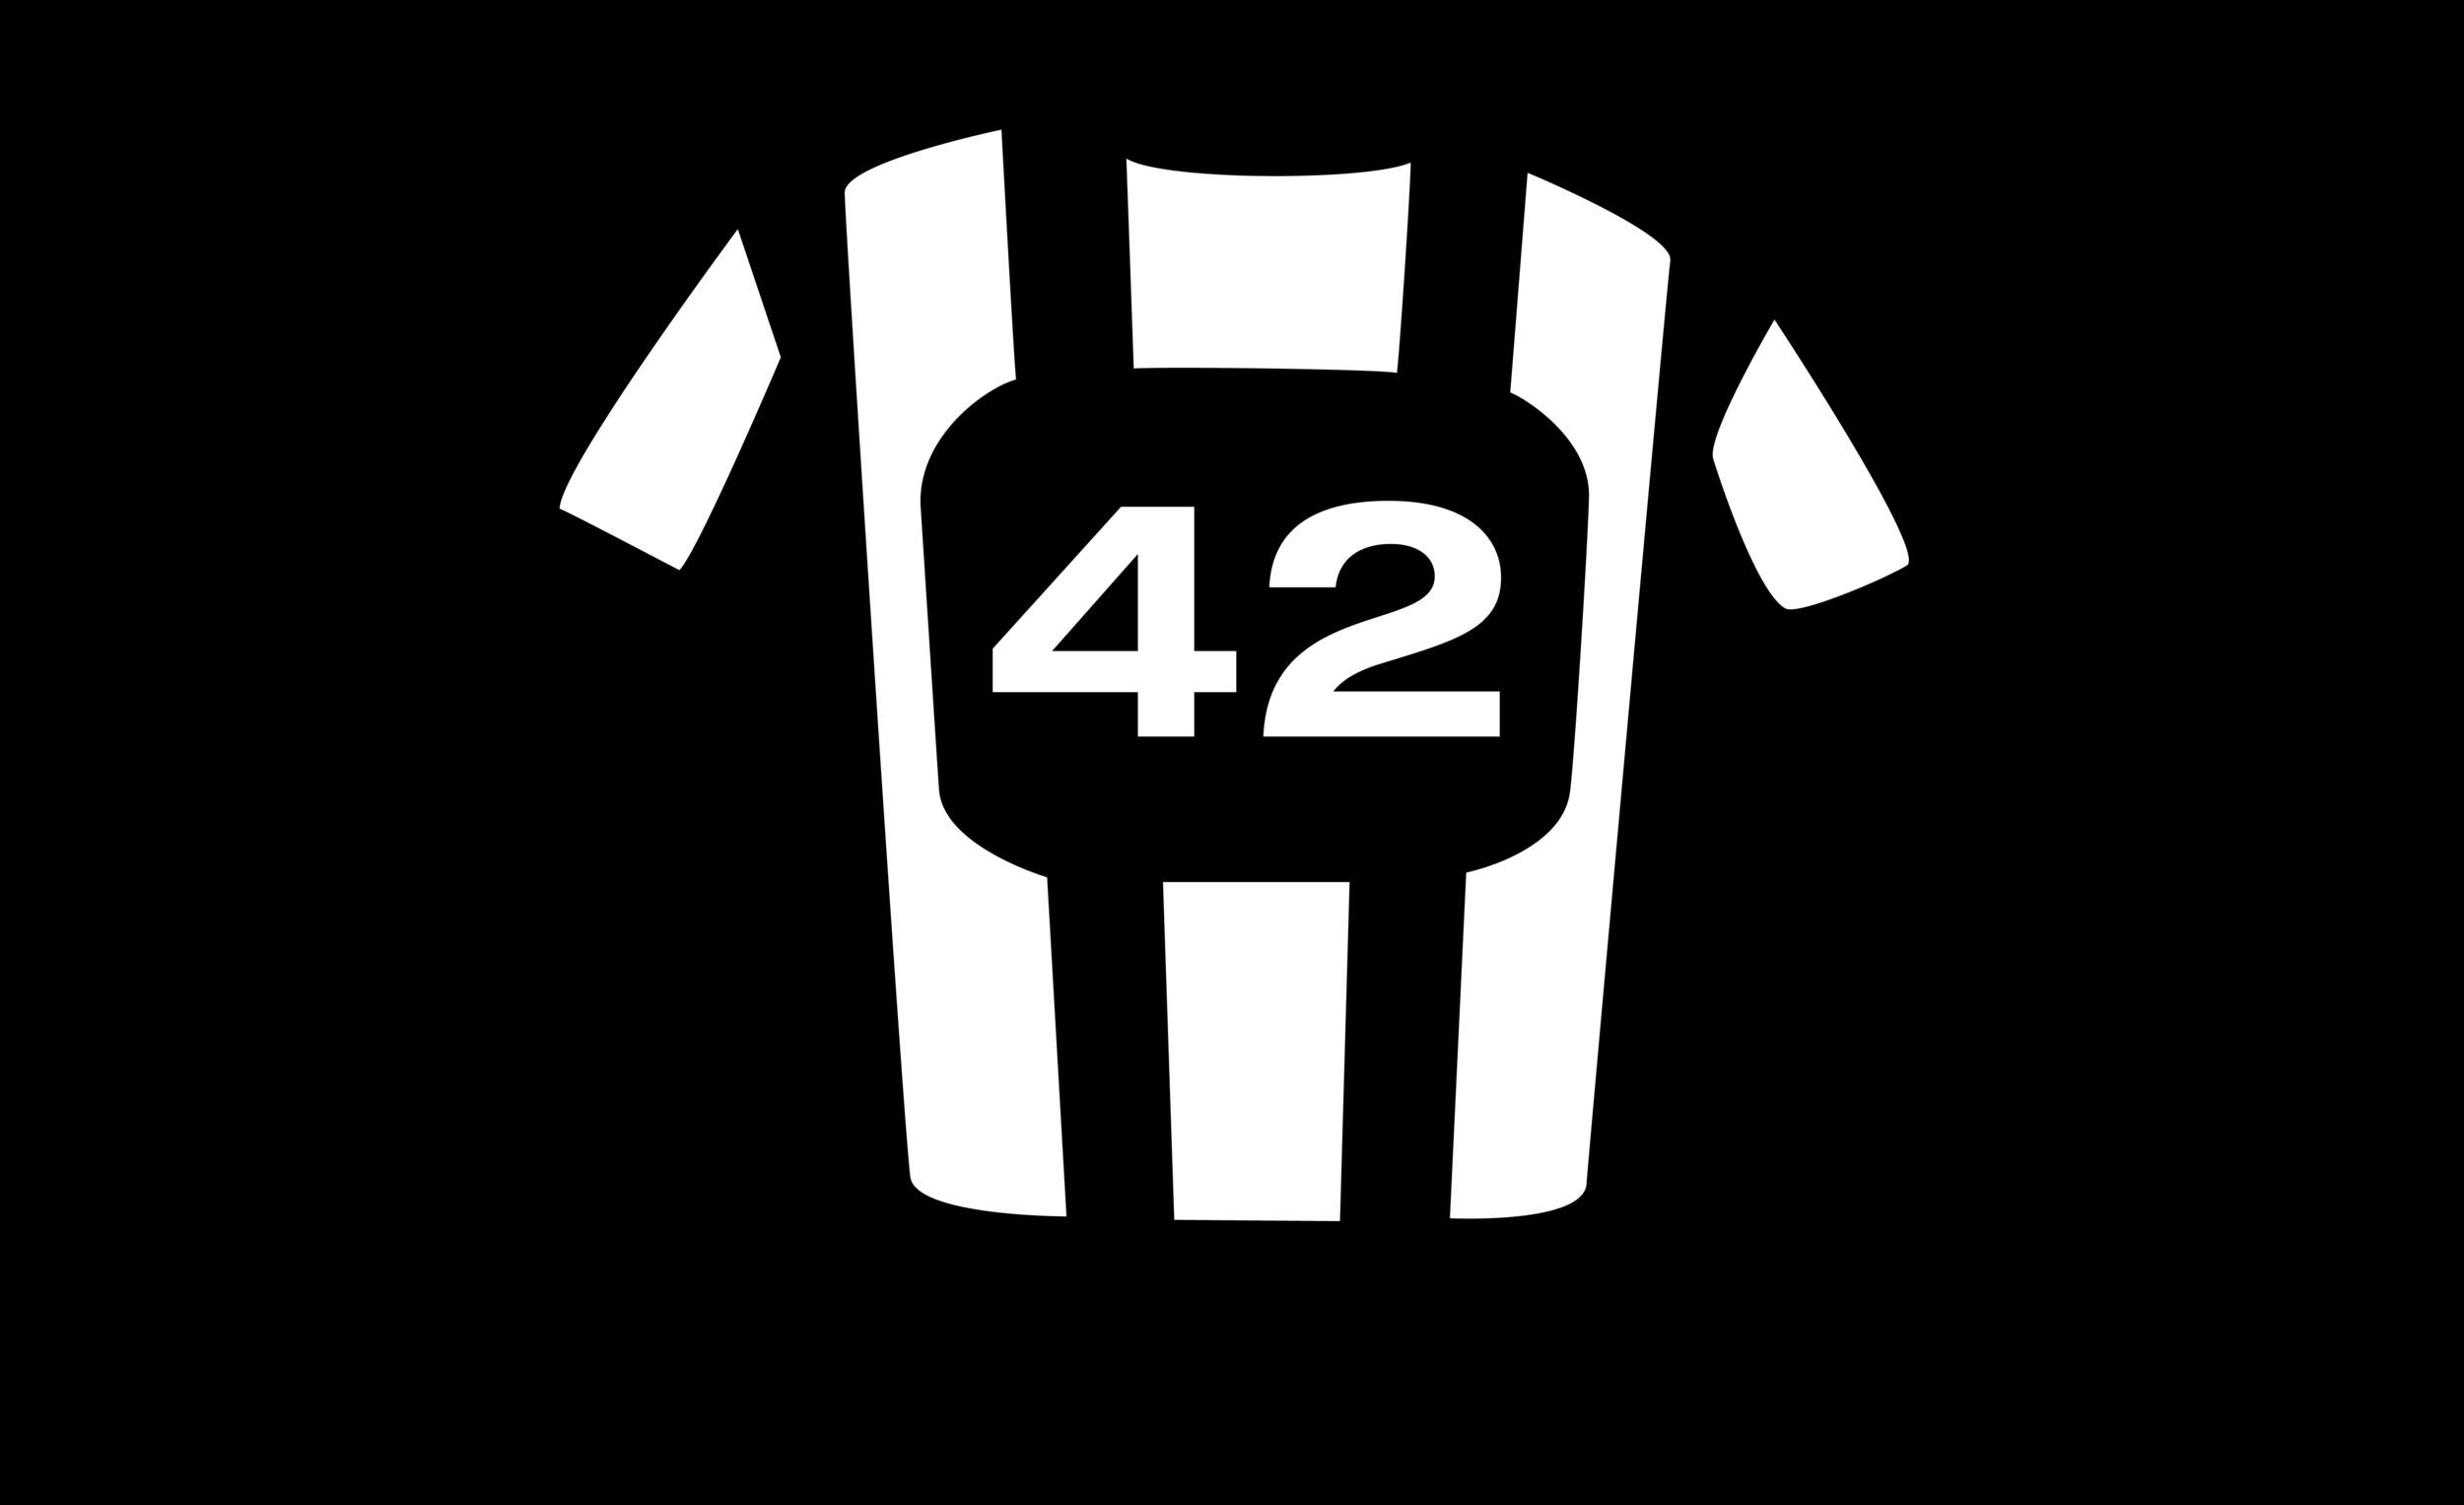 42 Film / Germany